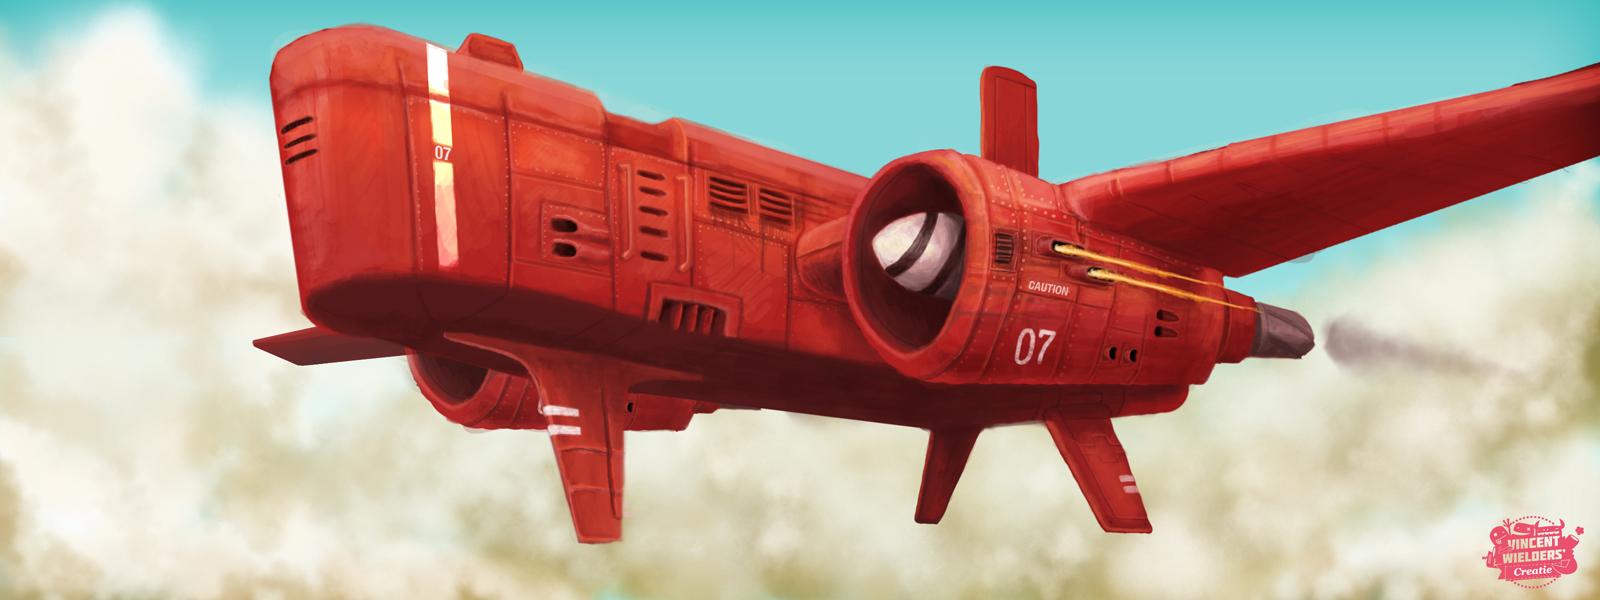 vliegtuig-kriebel-1600